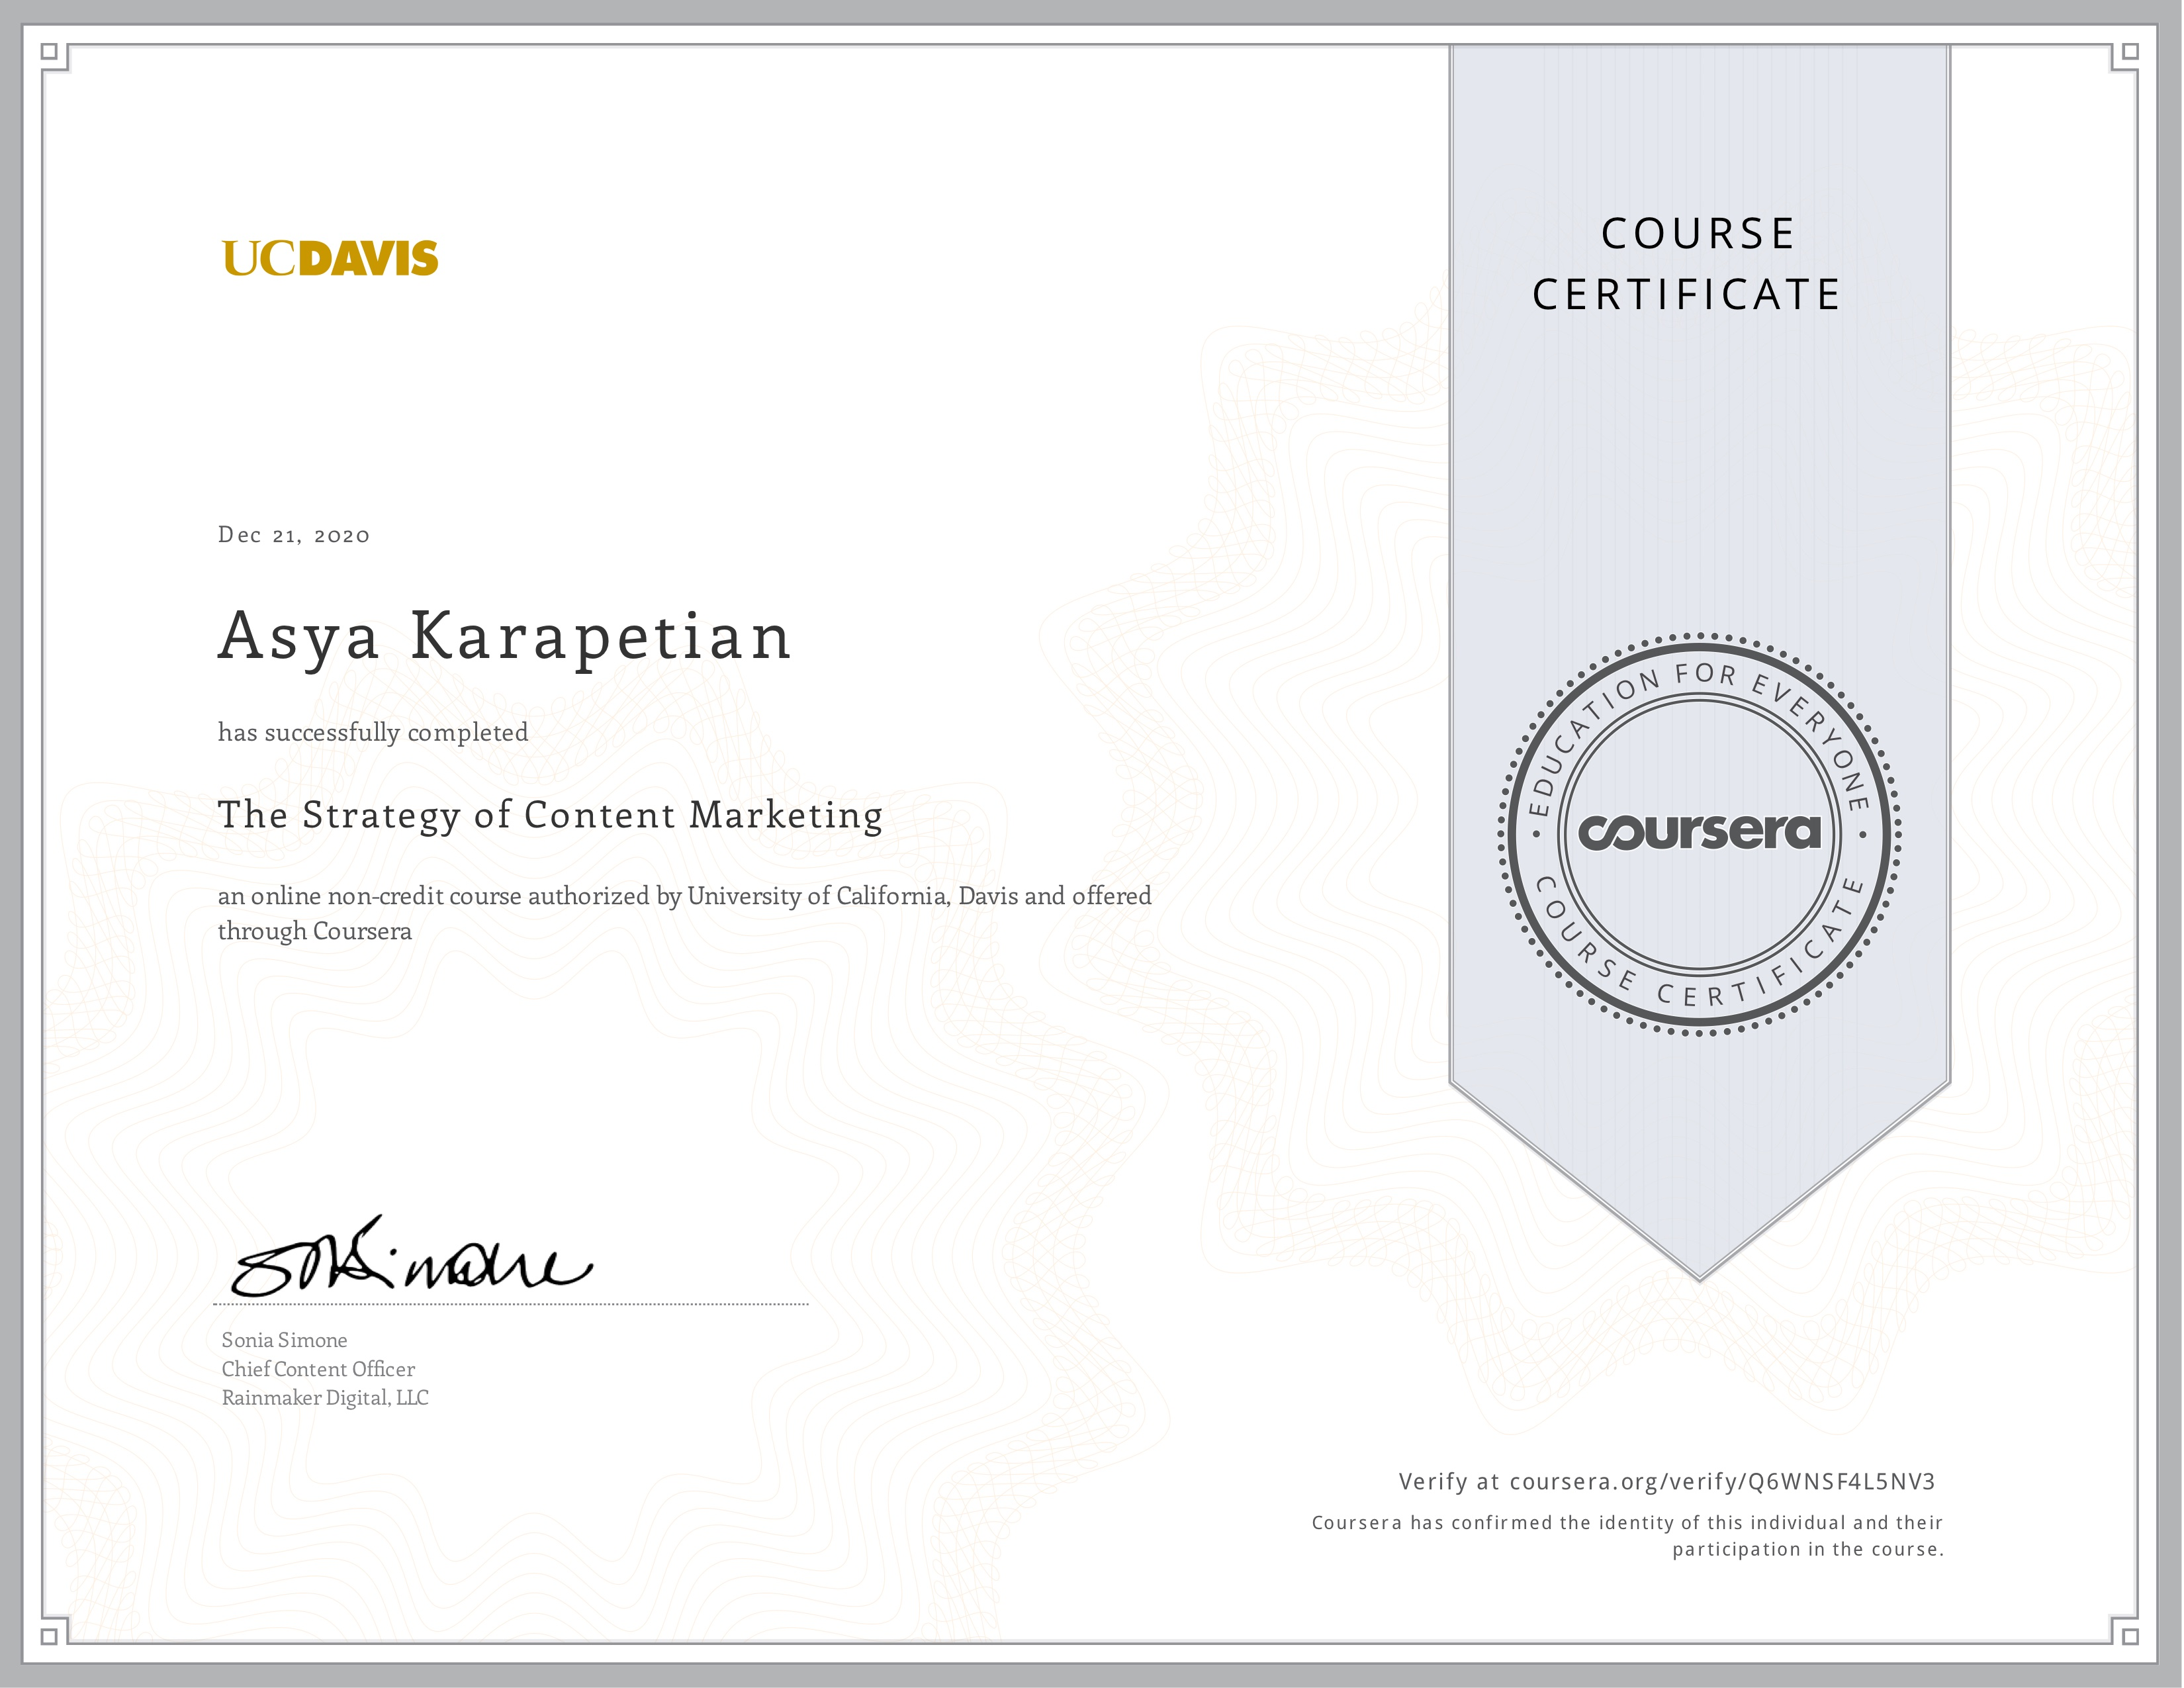 Asya Karapetyan certificate of content marketing